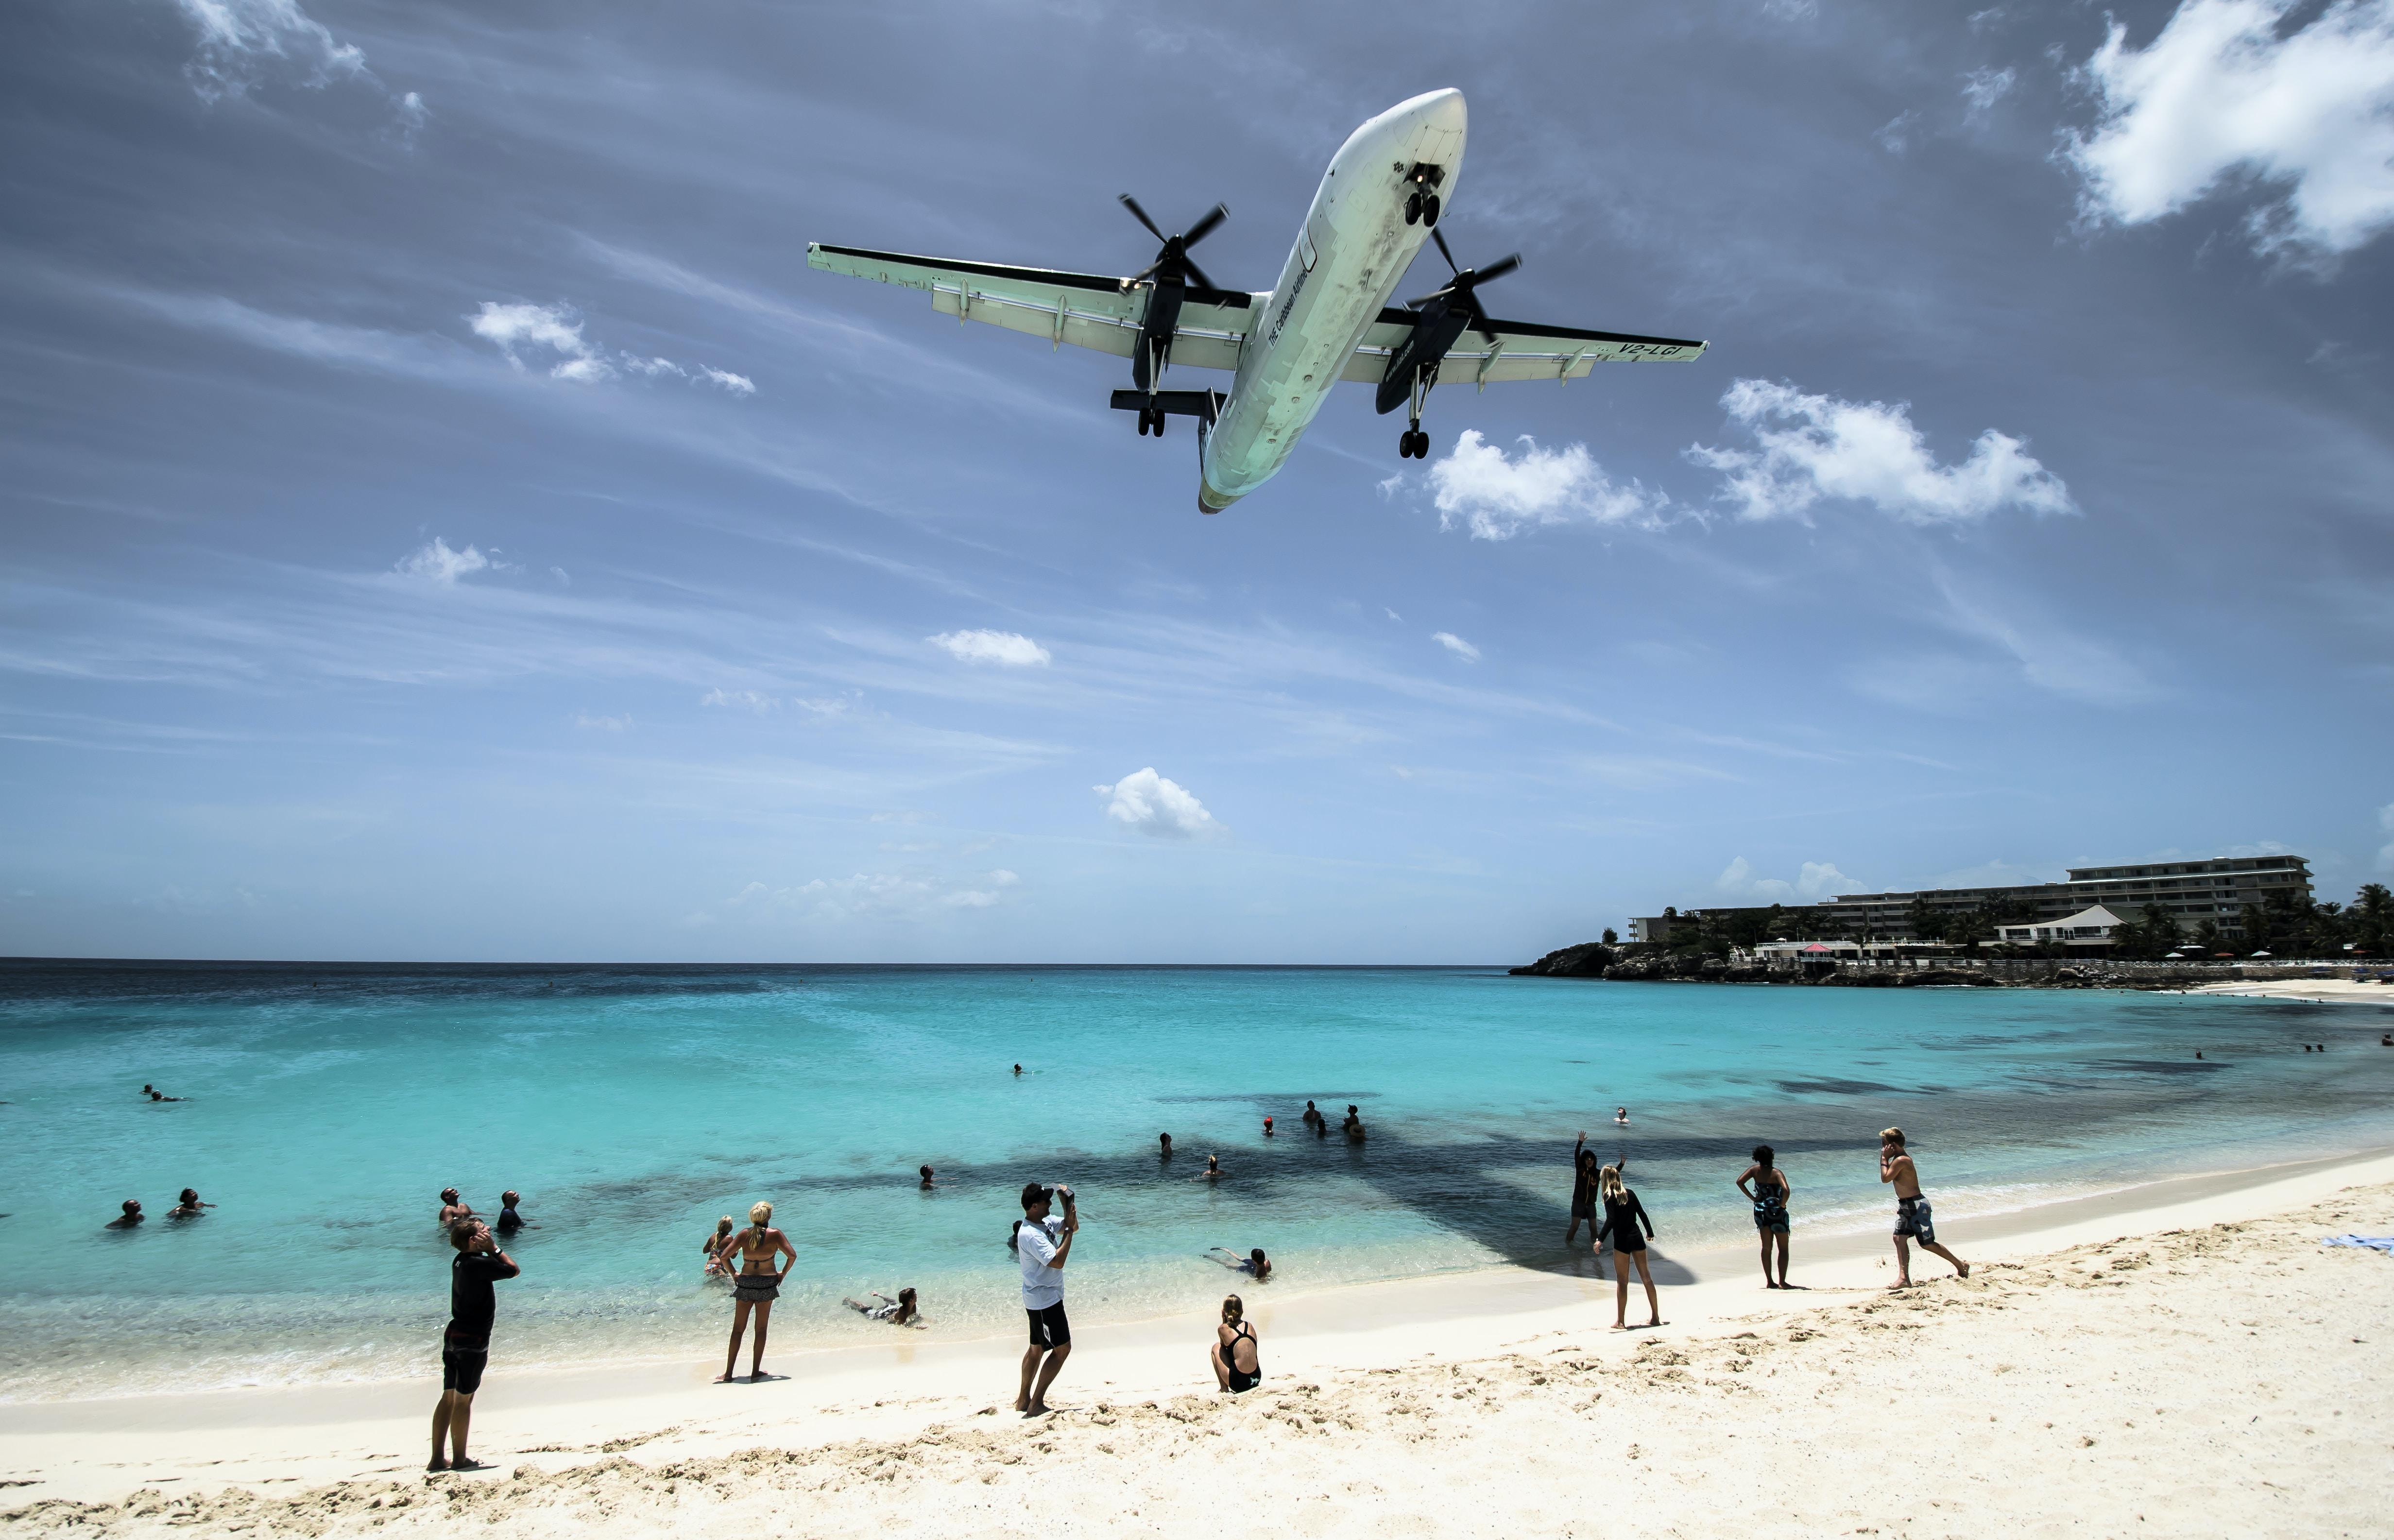 plane flying over seashore during daytime